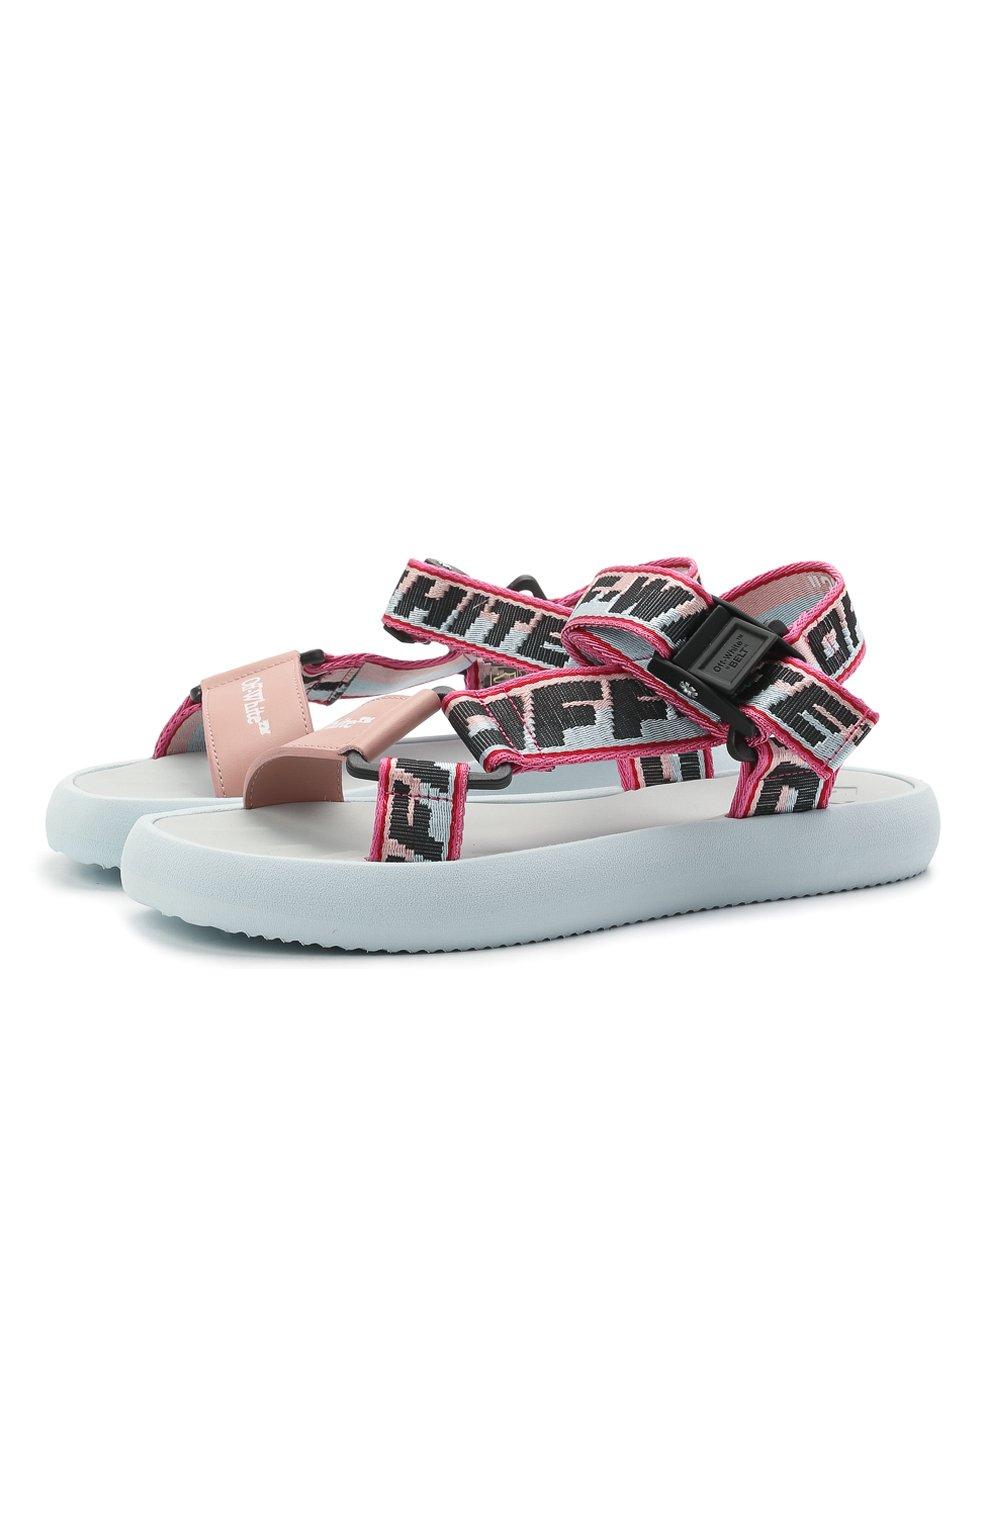 Женские текстильные сандалии OFF-WHITE розового цвета, арт. 0WIH007S21FAB0014230 | Фото 1 (Материал внешний: Текстиль; Подошва: Платформа)